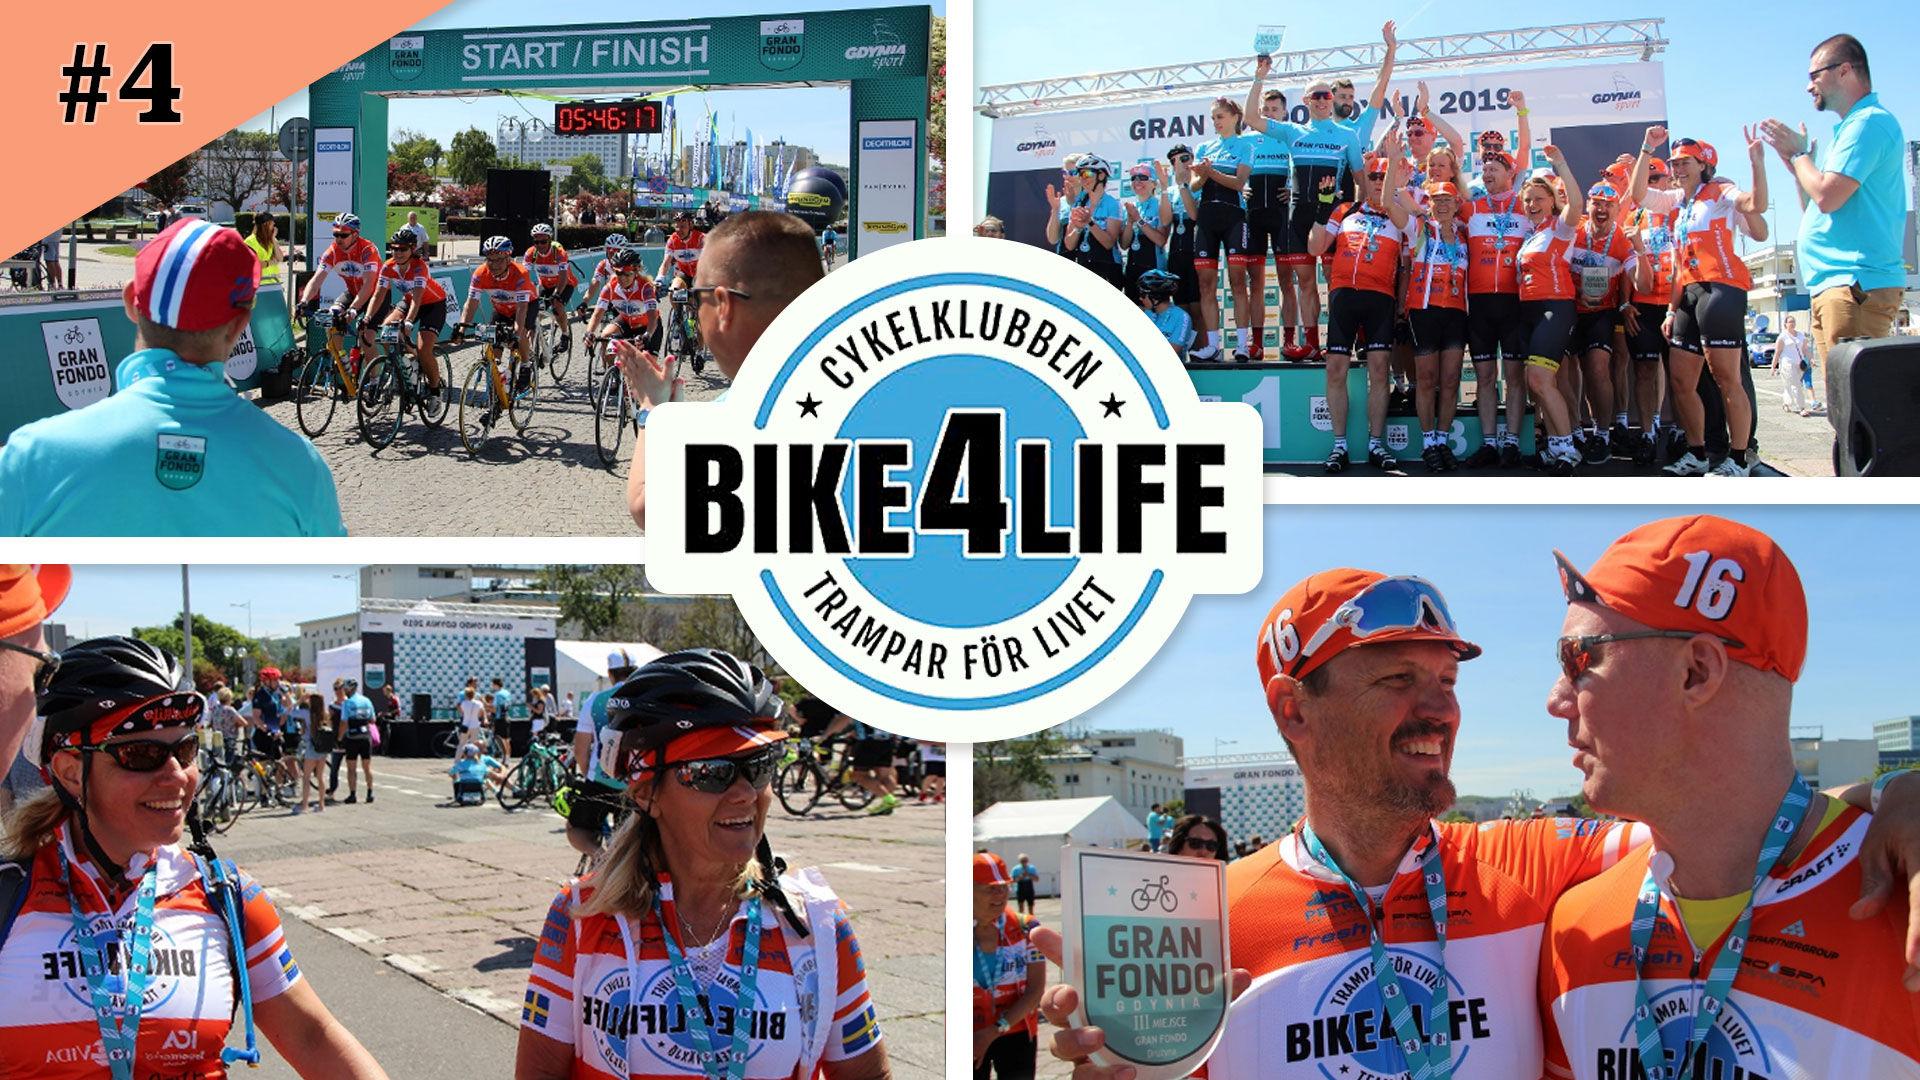 Bike4Life etapp 4